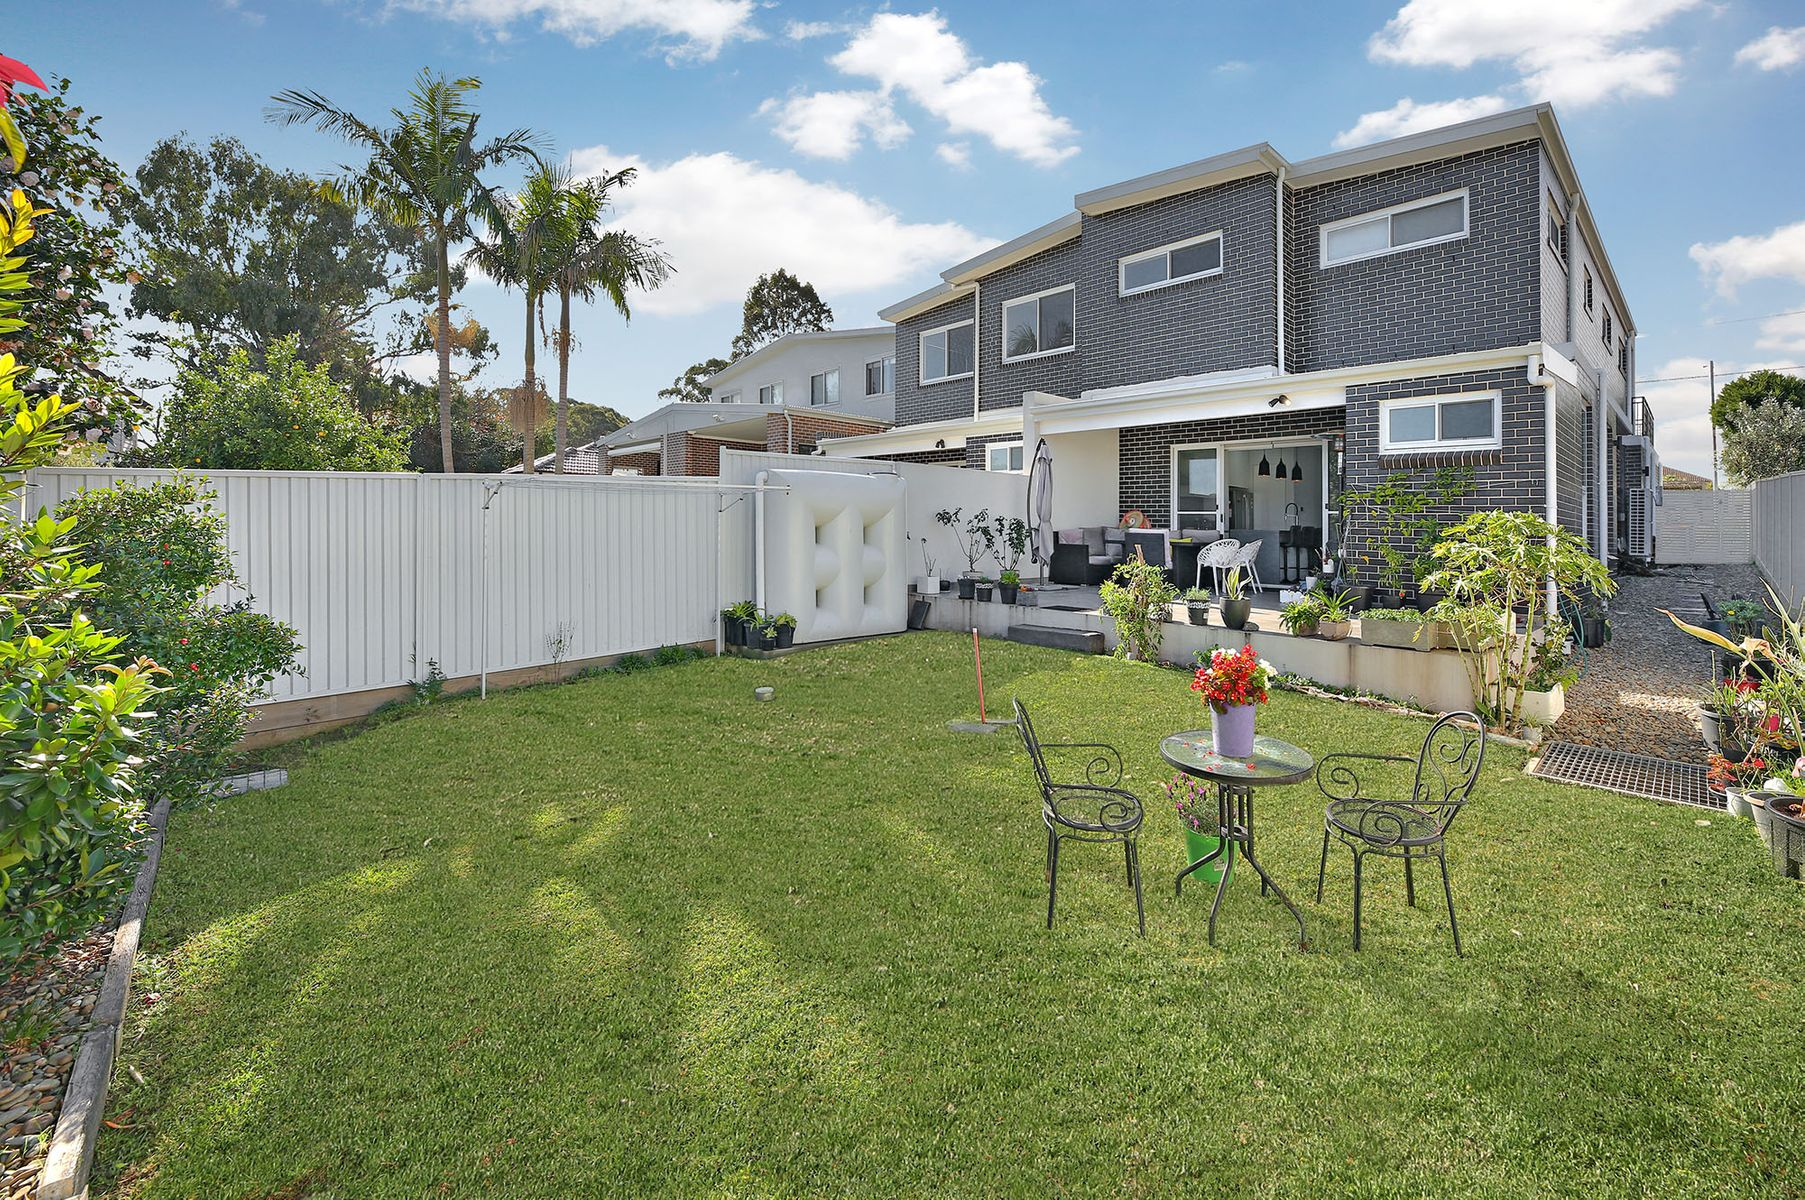 12A Carson Street, Panania, NSW 2213